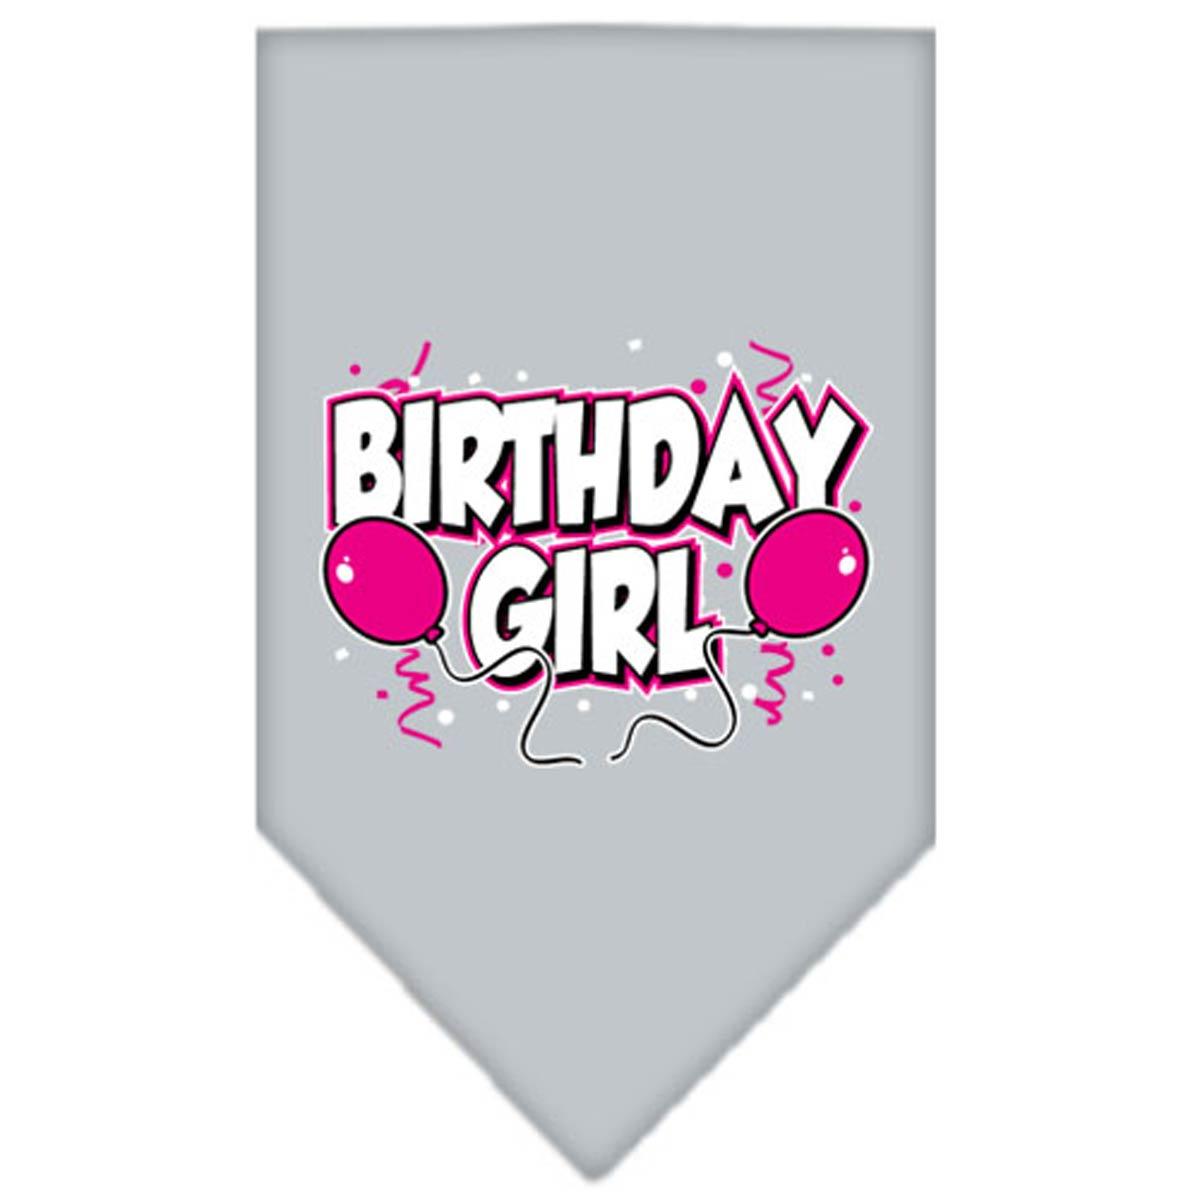 Birthday Girl Screen Print Dog Bandana - Gray